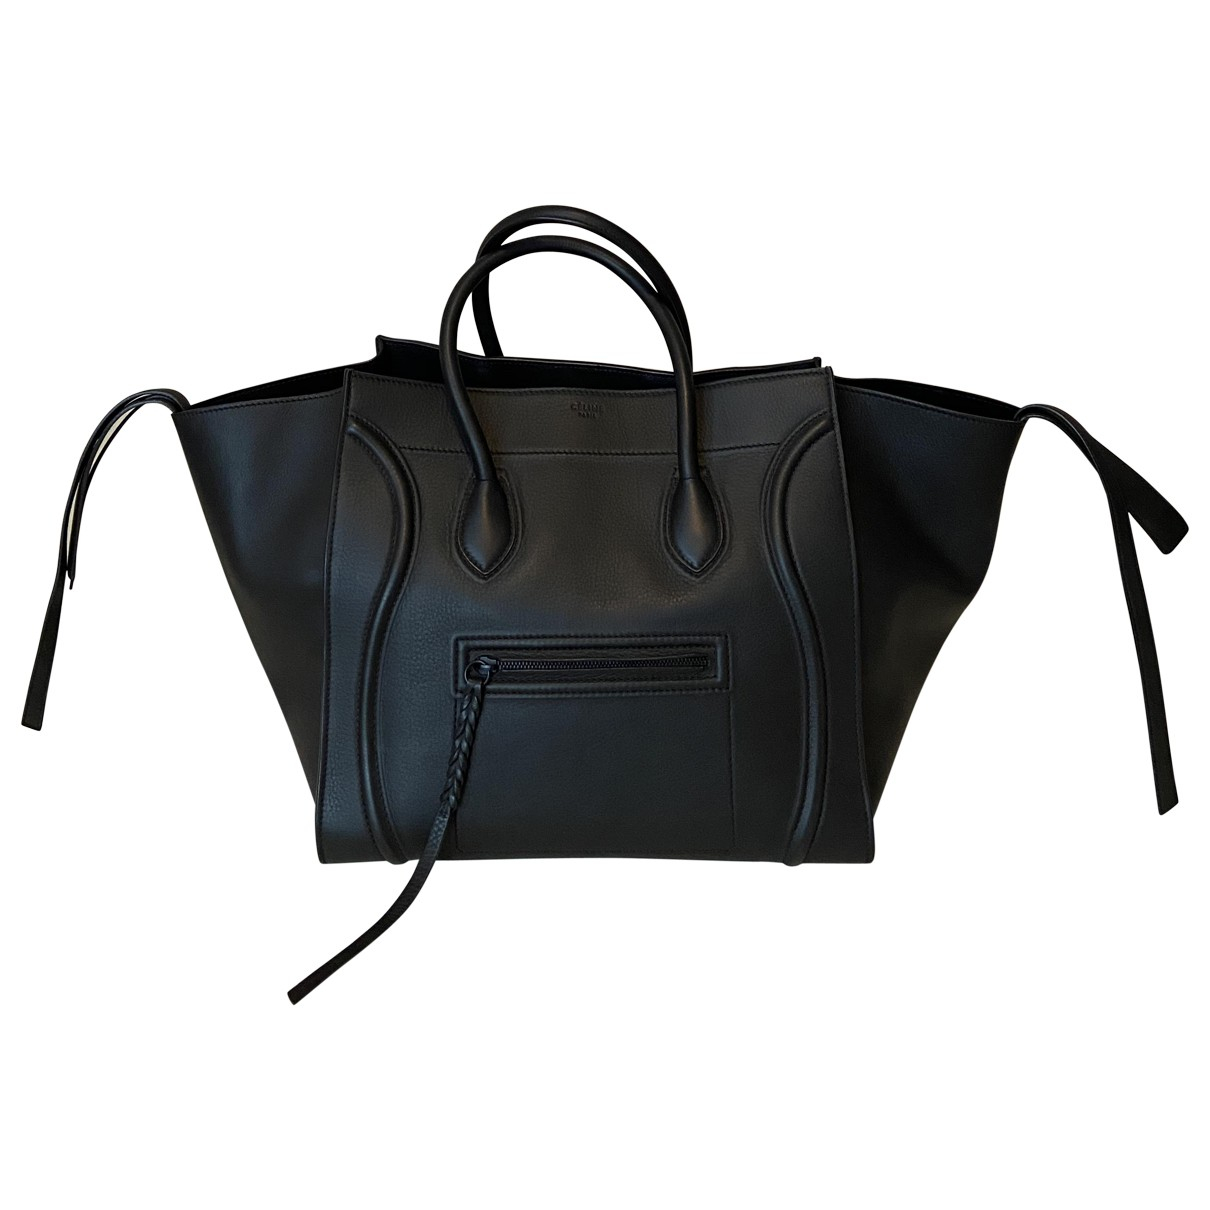 Celine Luggage Phantom Handtasche in  Schwarz Leder